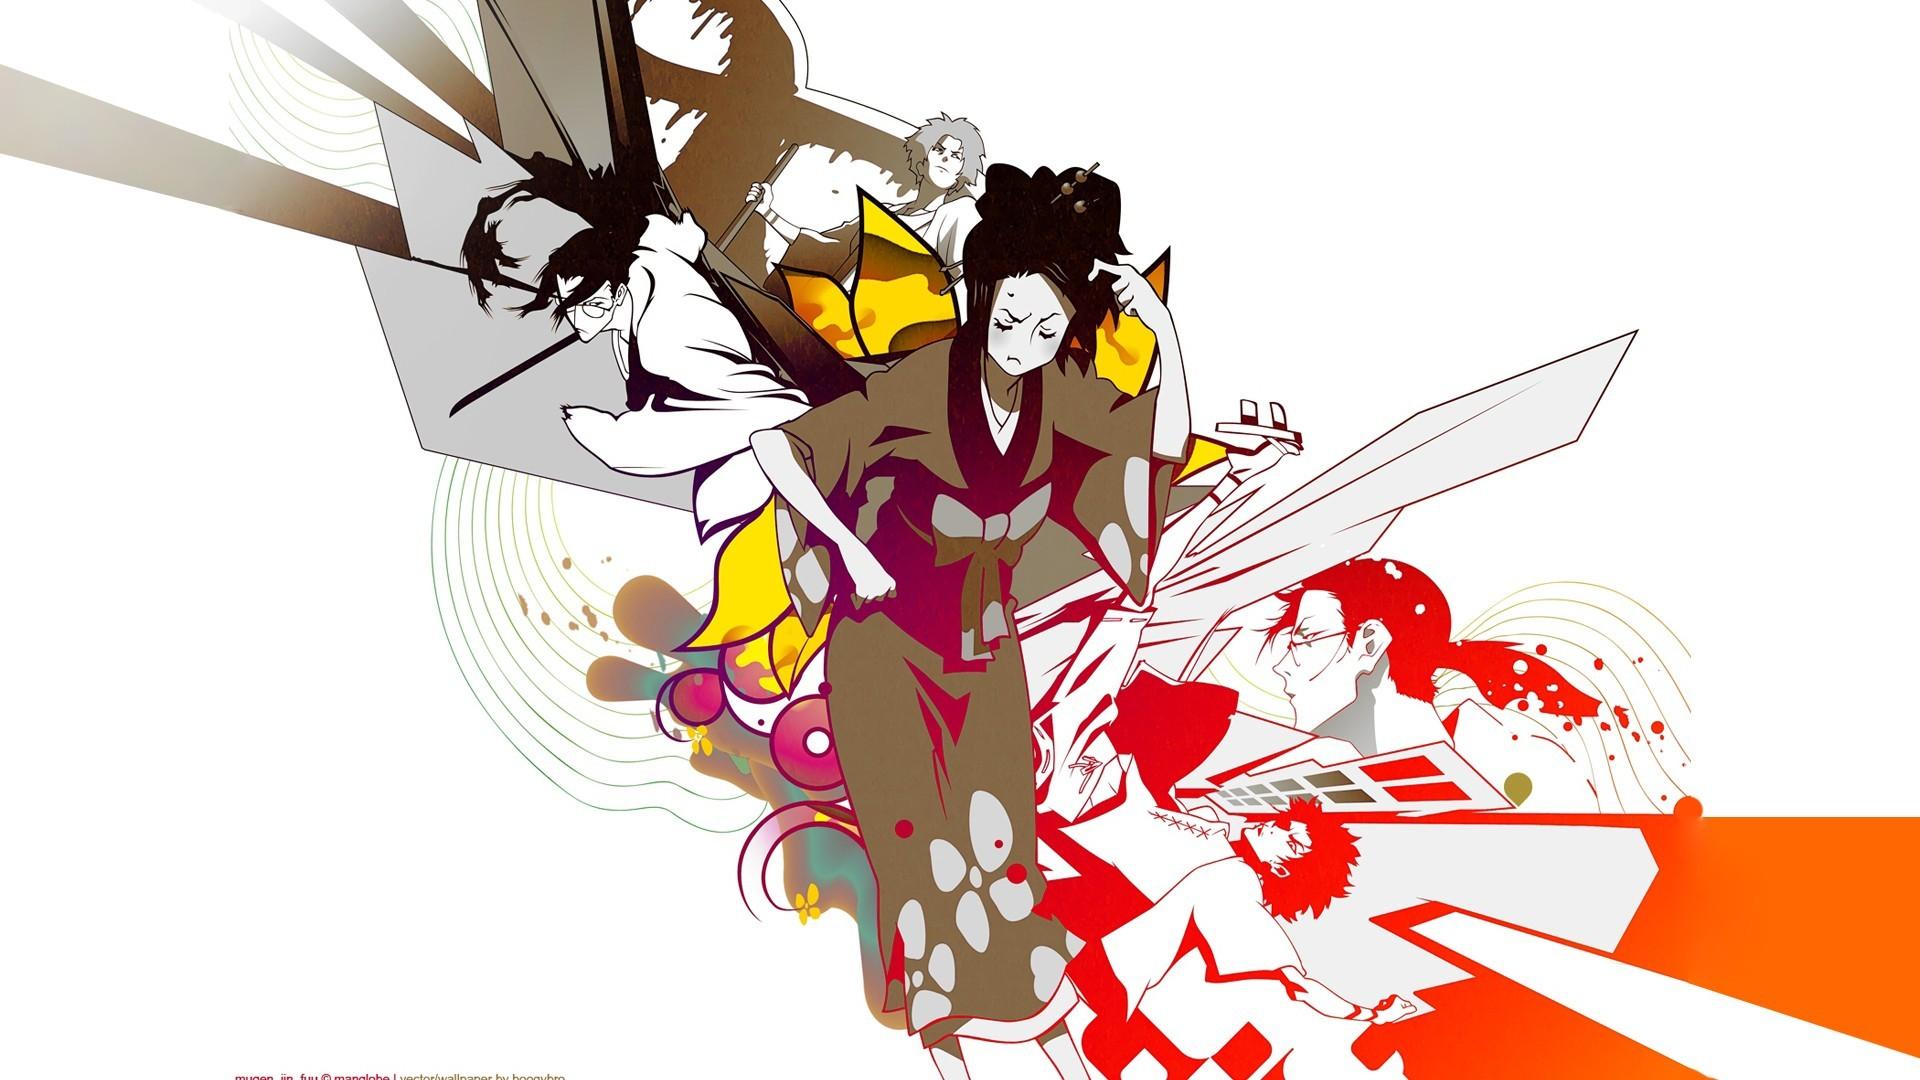 Samurai Champloo Mugen characters anime Fuu Japanese clothes anime girls  Jin Roh wallpaper     222394   WallpaperUP